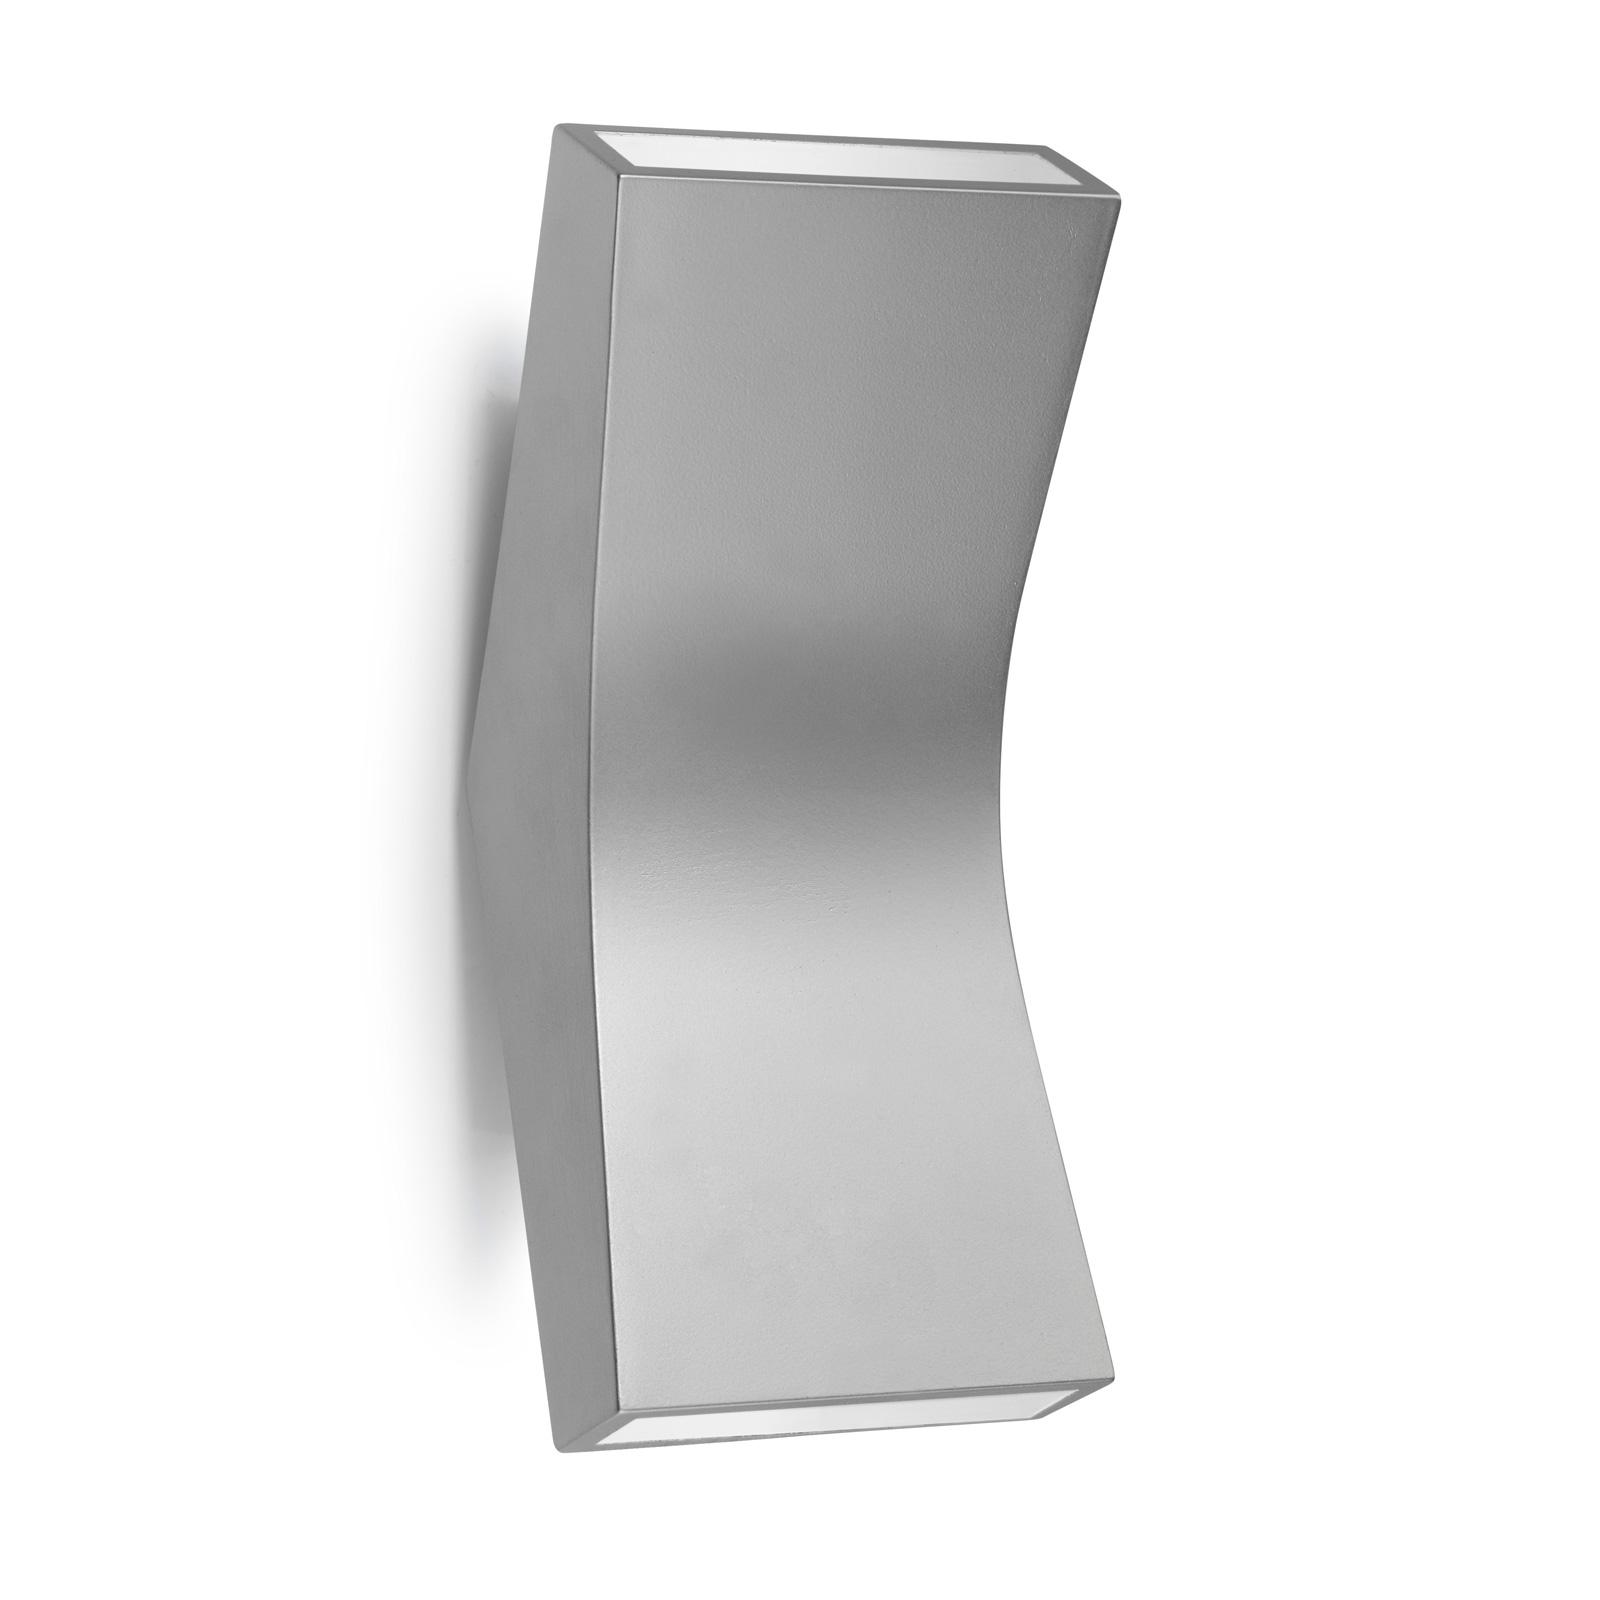 Grok Bend applique LED 05-4394 up/down aluminium